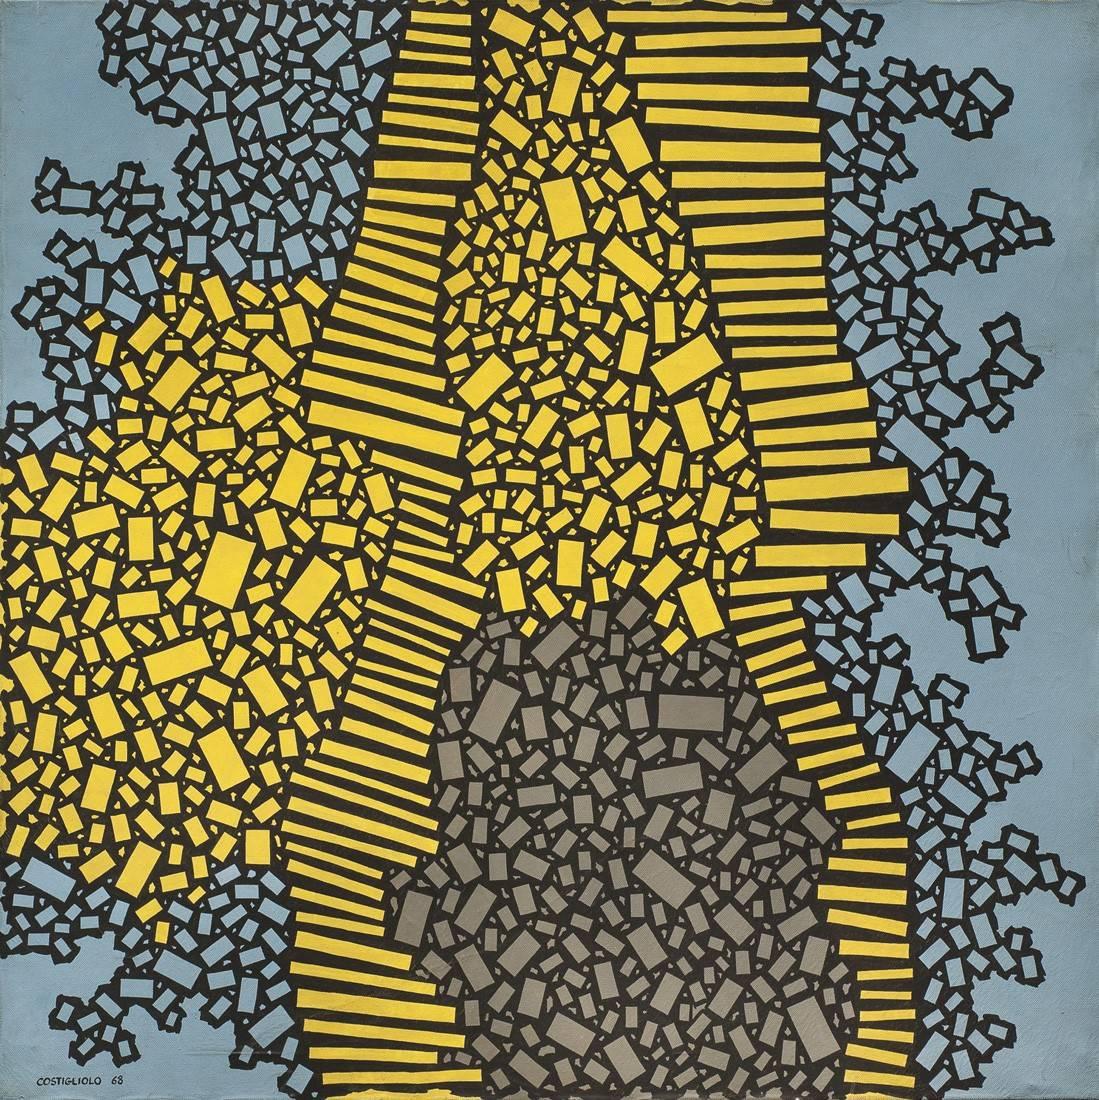 Obra ampliada: Rectangulos LXVIII - José Pedro Costigliolo